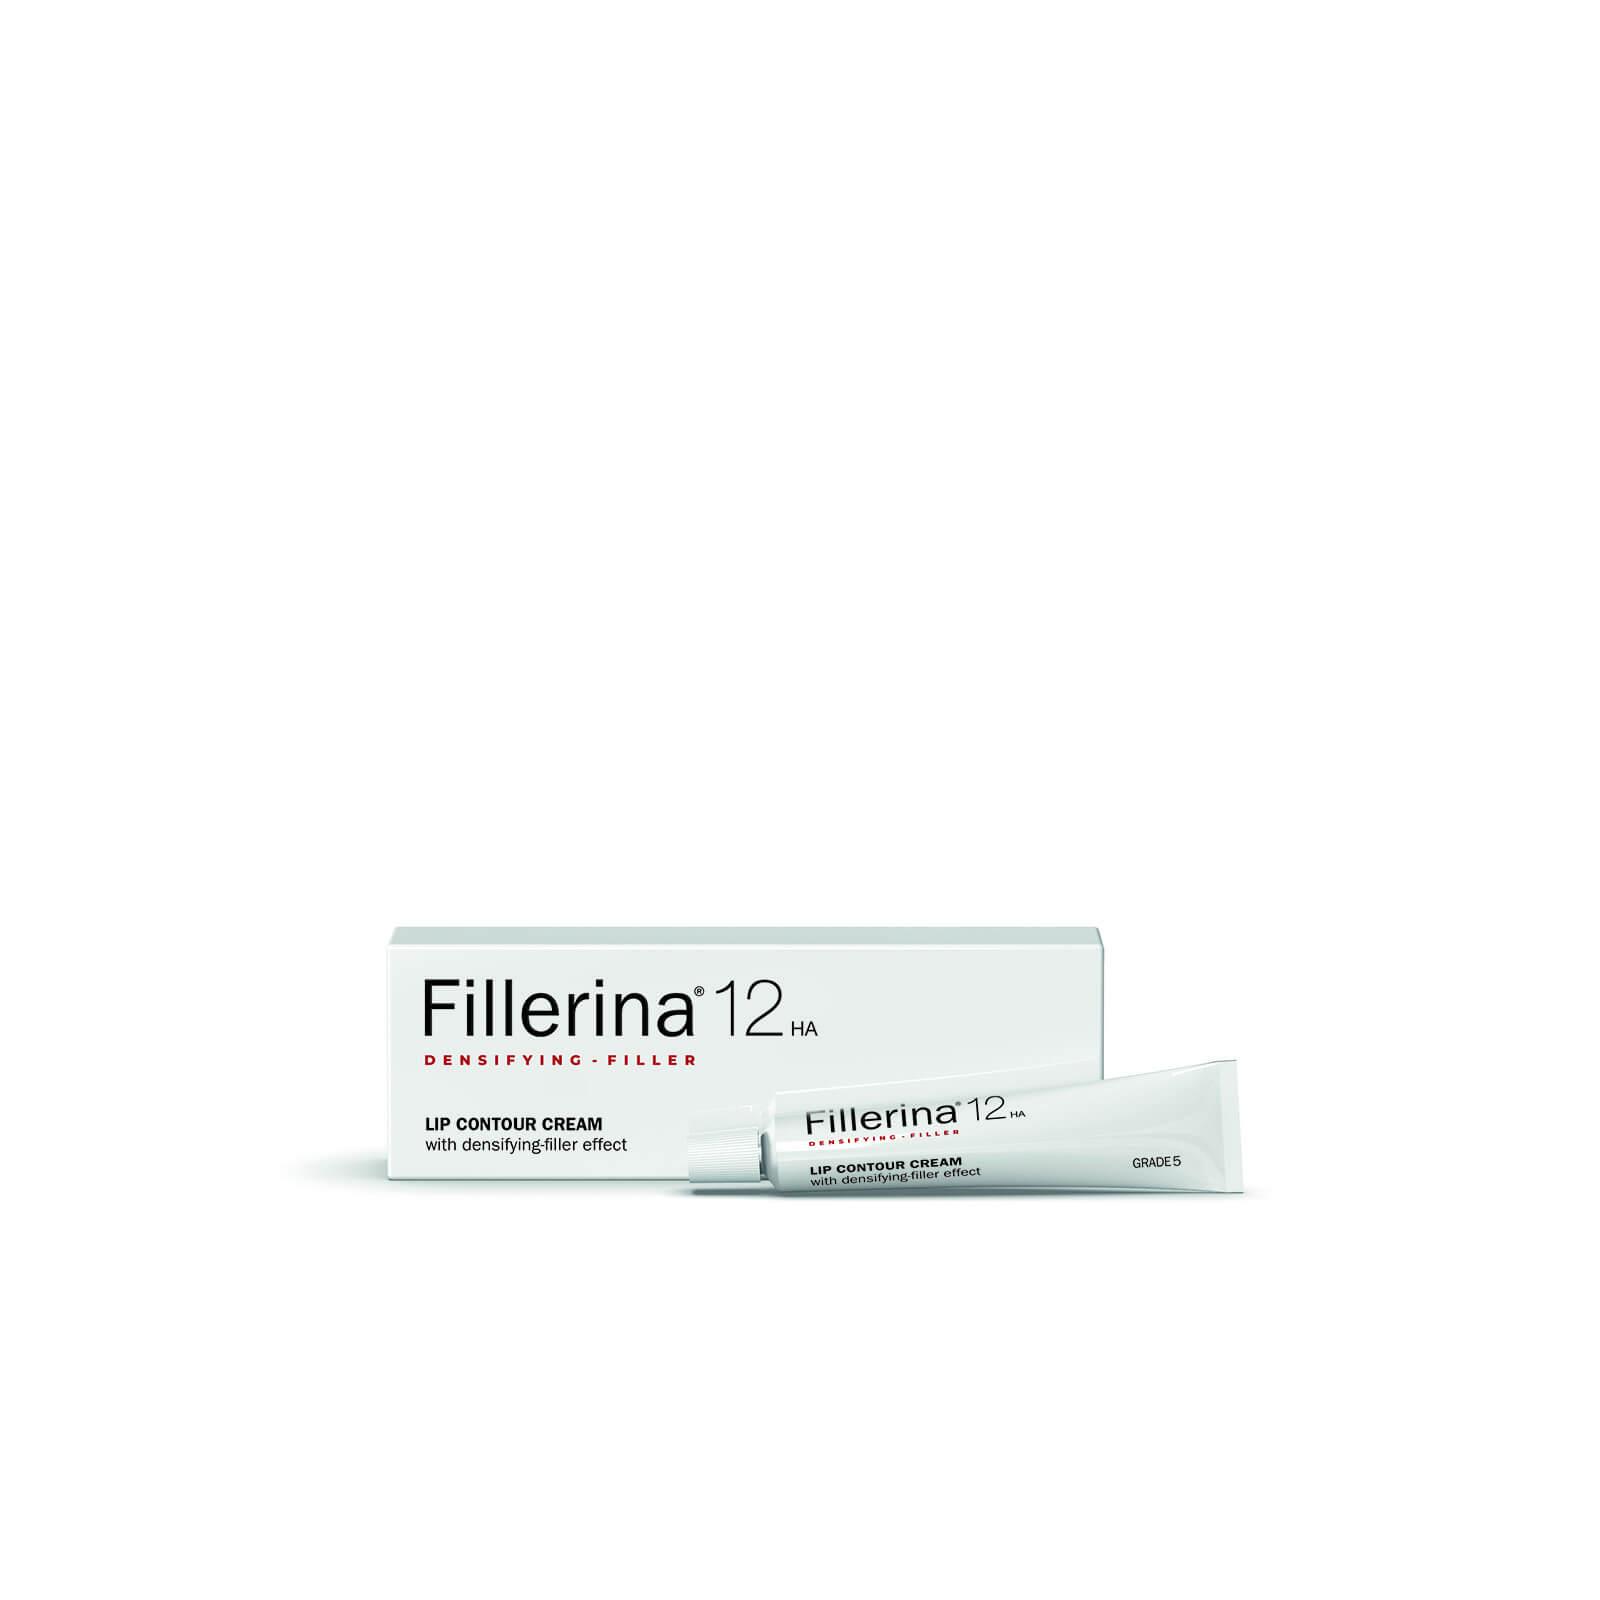 Fillerina 12 Densifying-Filler Lip Contour Cream - Grade 5 50ml